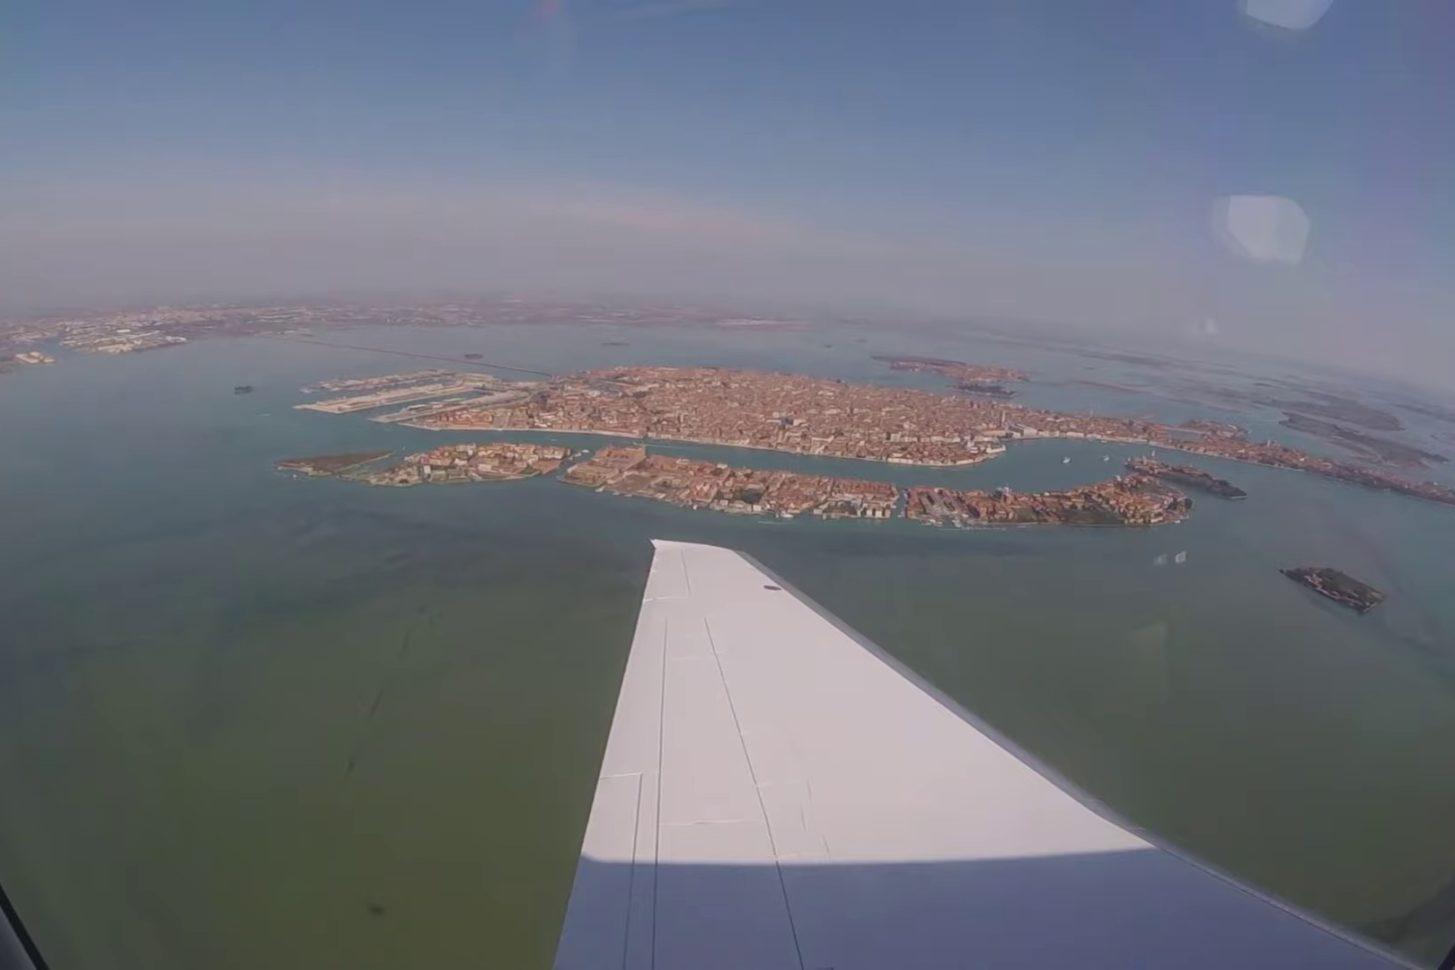 Businessjet Pilatus PC-24 landet in Lido di Venezia